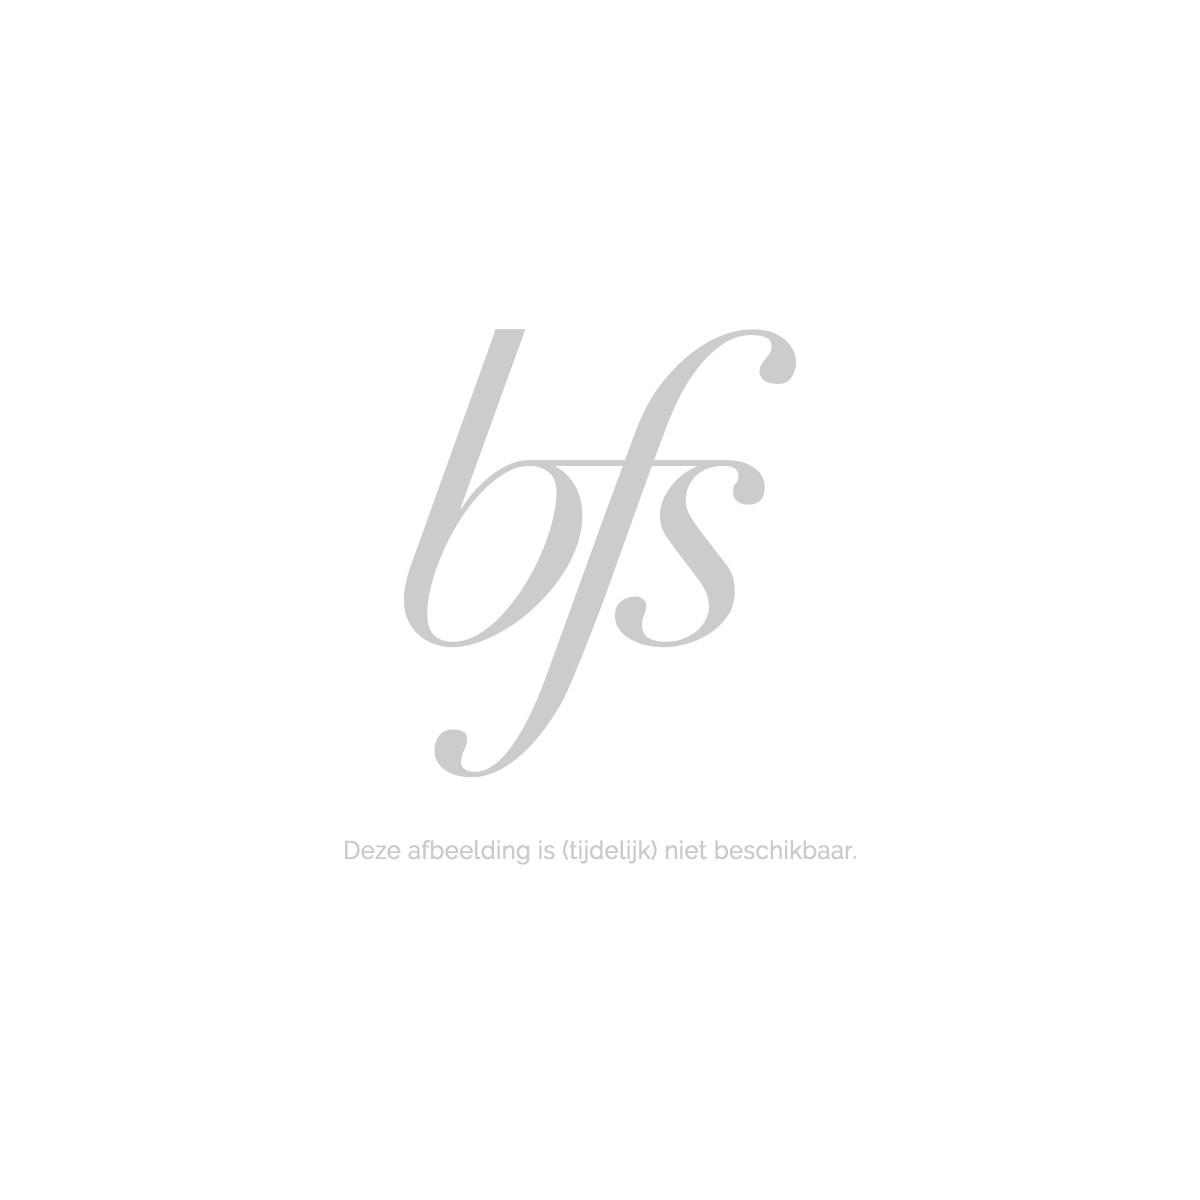 Nanogen Fiber Kaneel Bruin (Cinnamon) 30 G